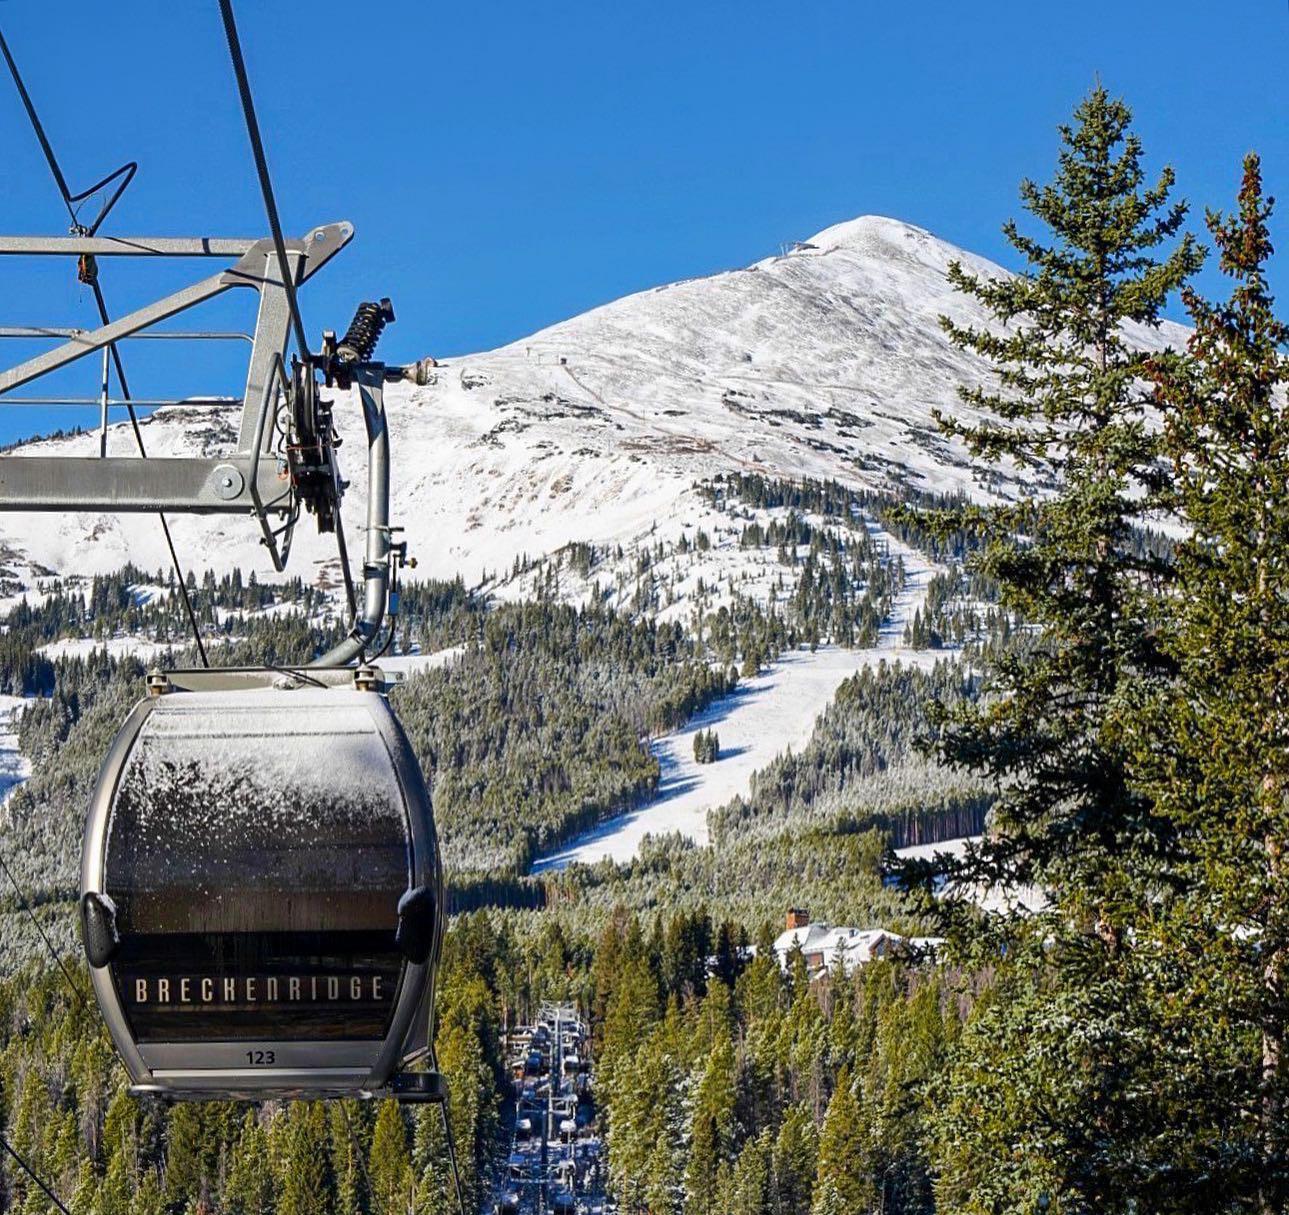 Image of the BreckConnect Gondola going up the snowy mountain in Breckenridge, Colorado